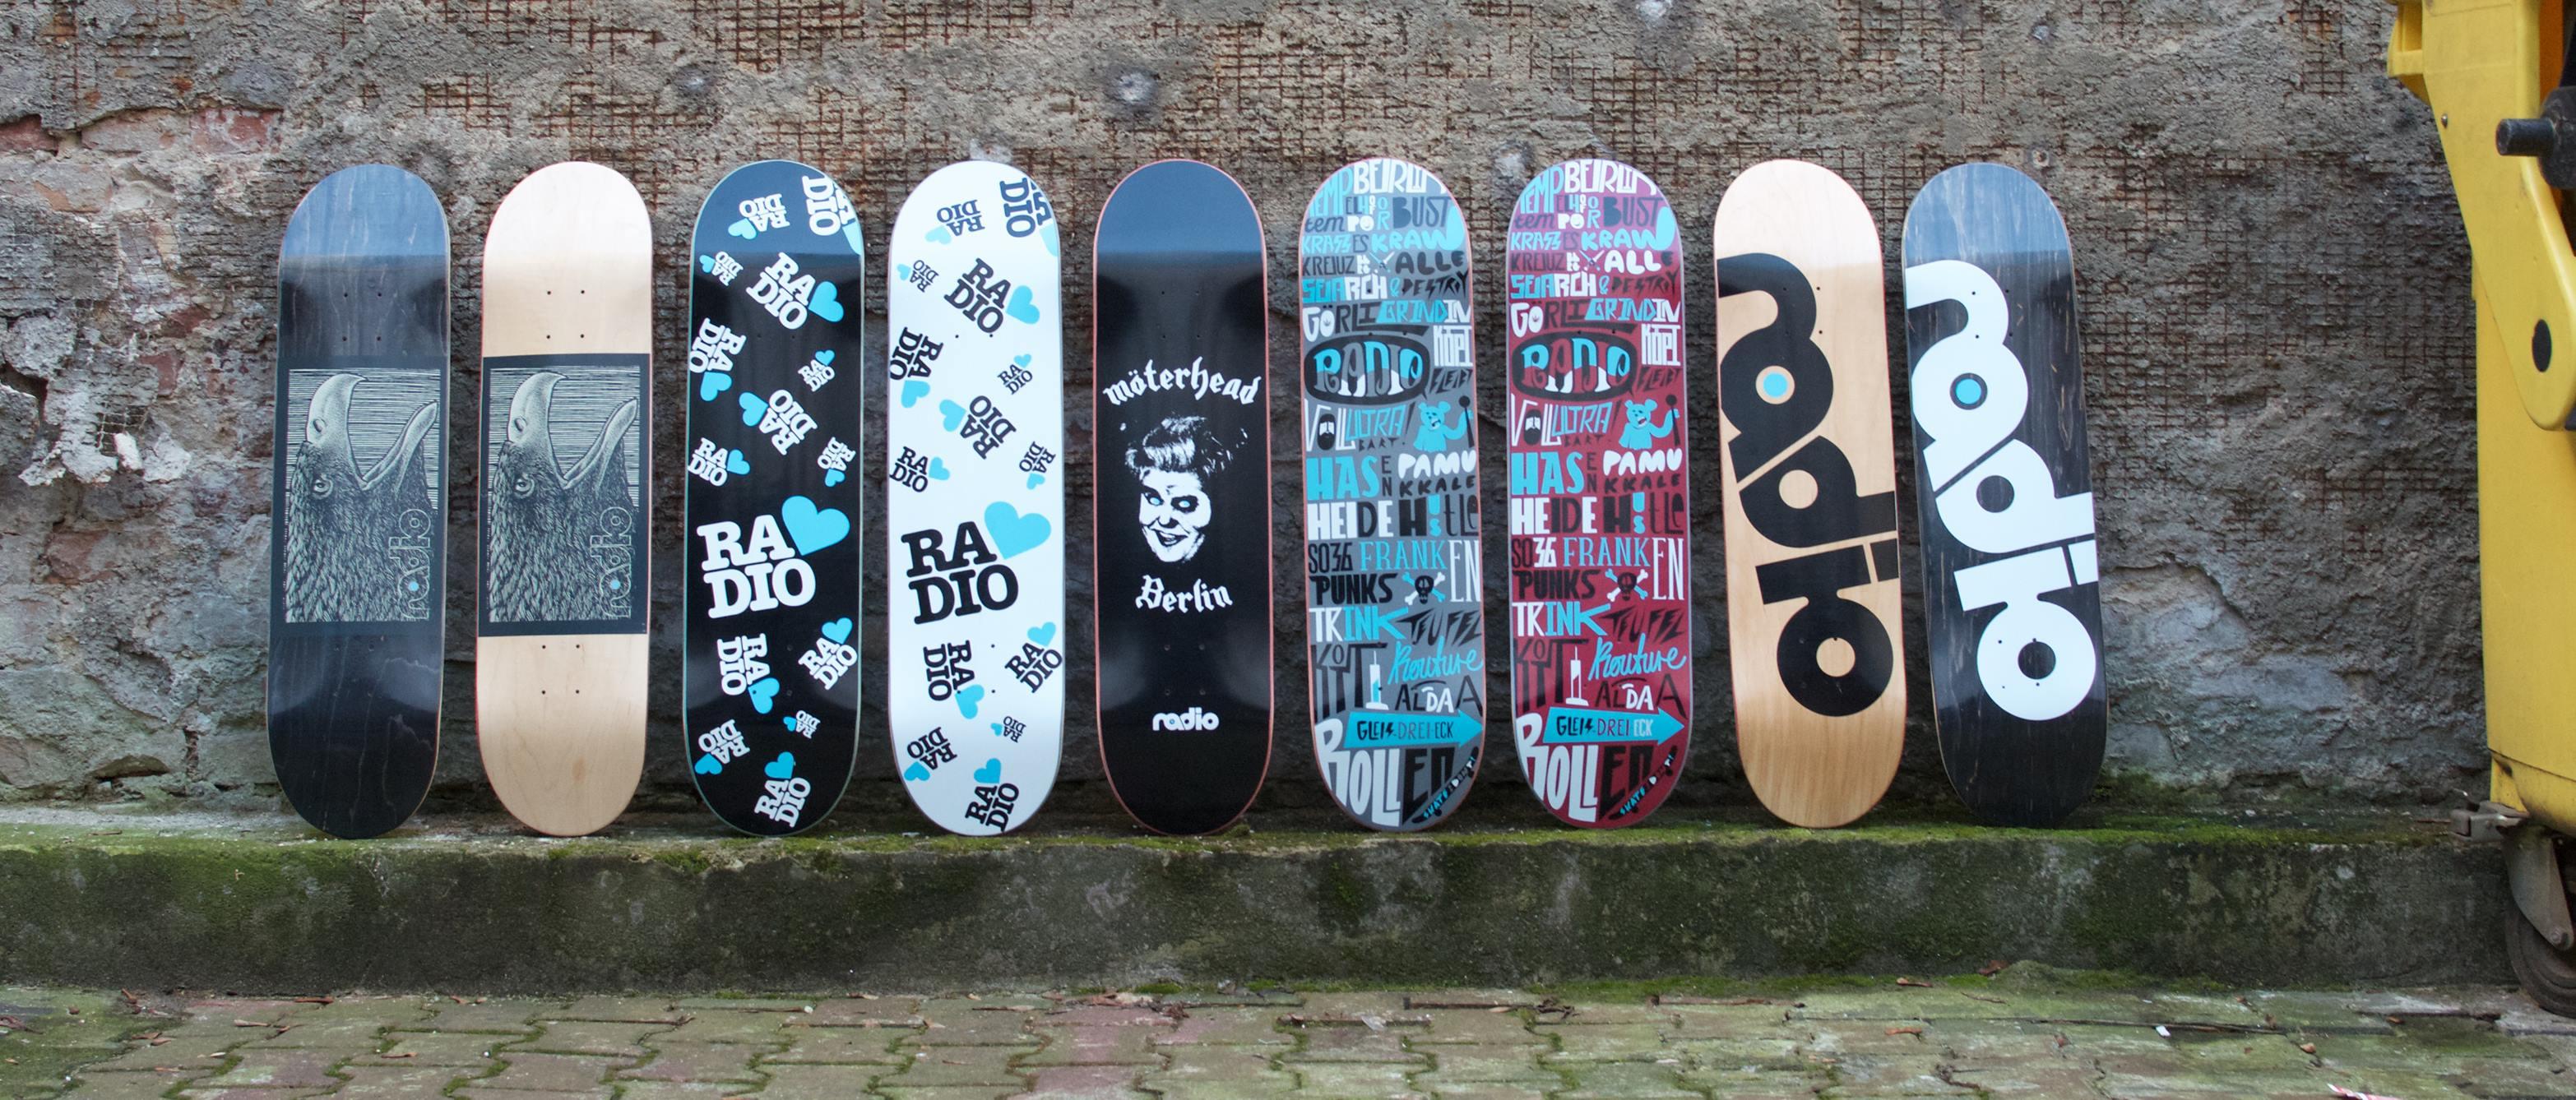 United Decks of Radio Skateboards